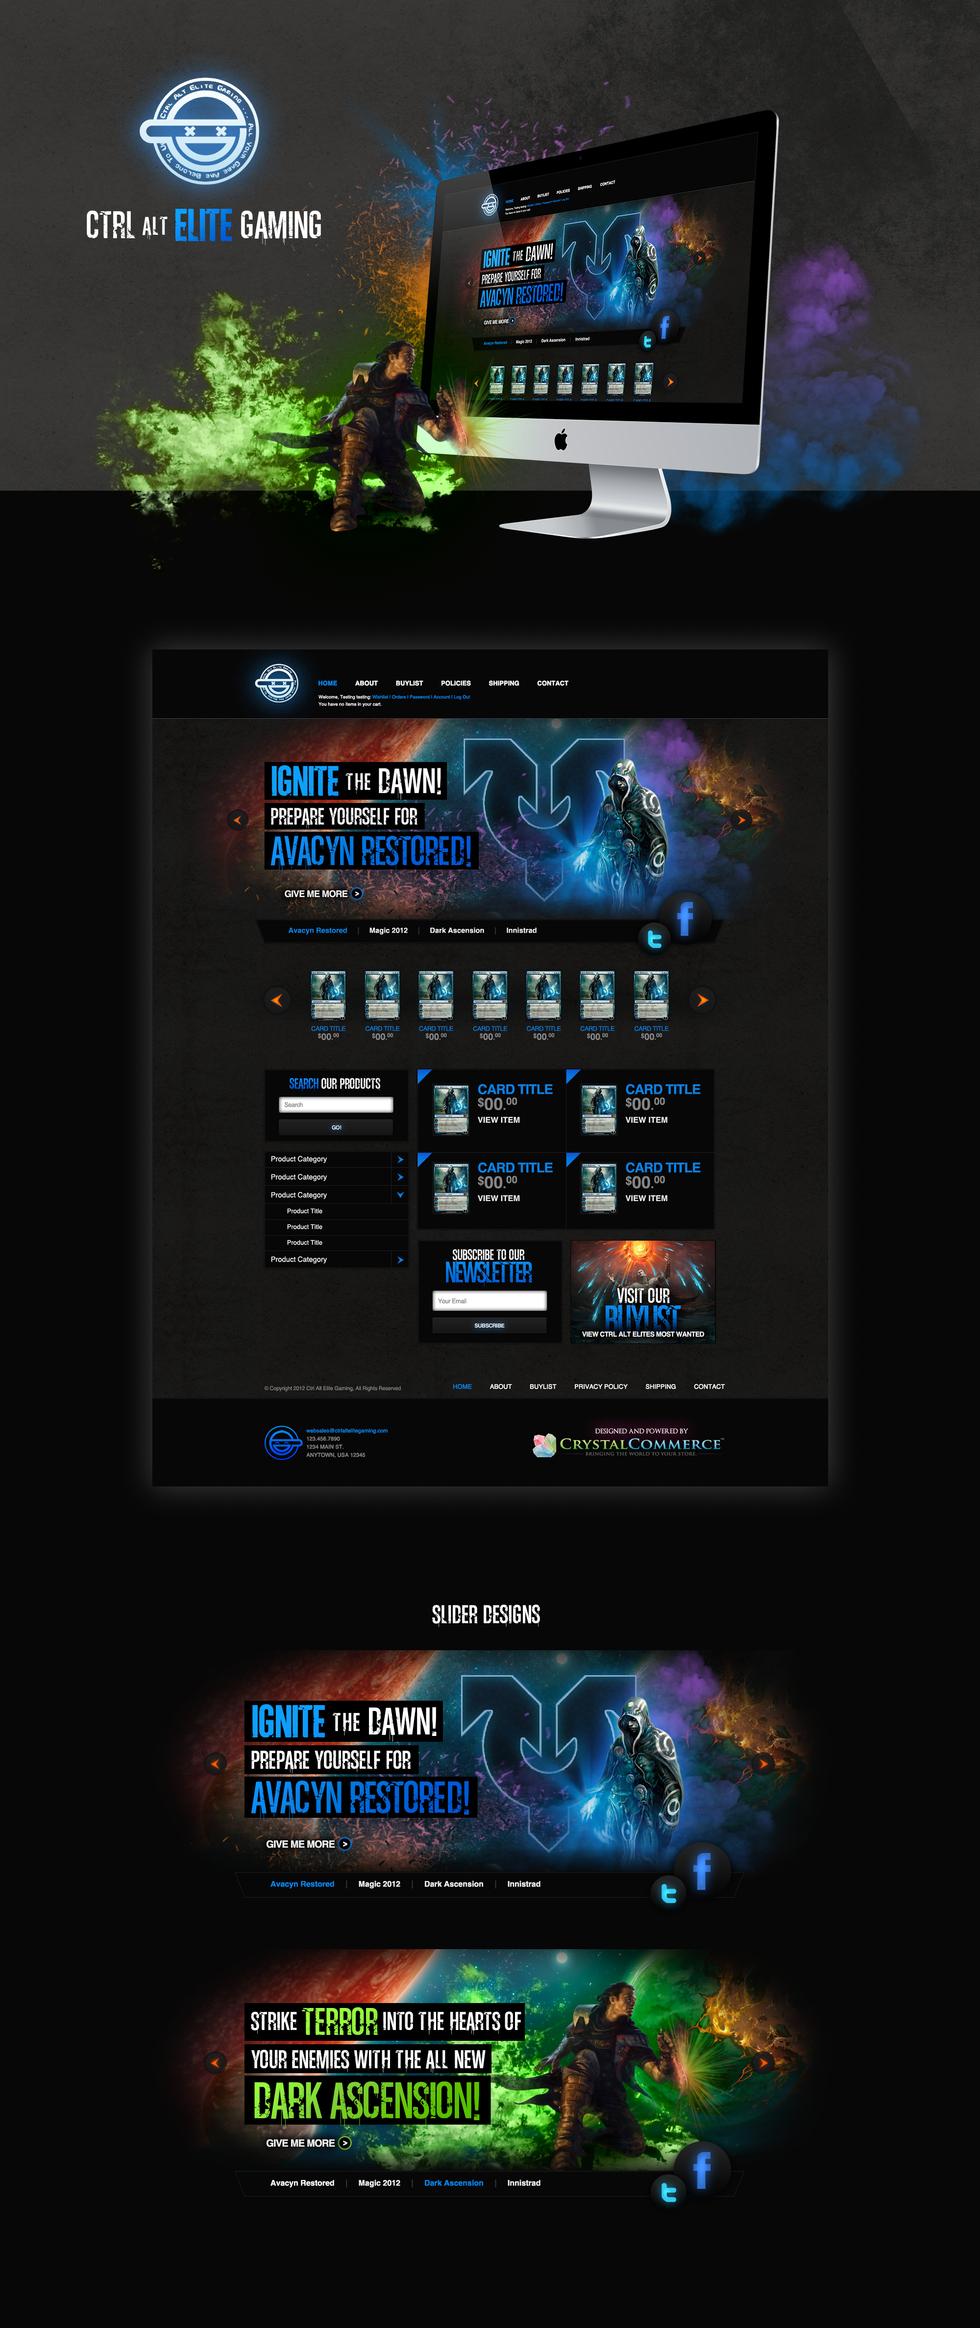 CtrlAltElite Home Page and Hero Slides